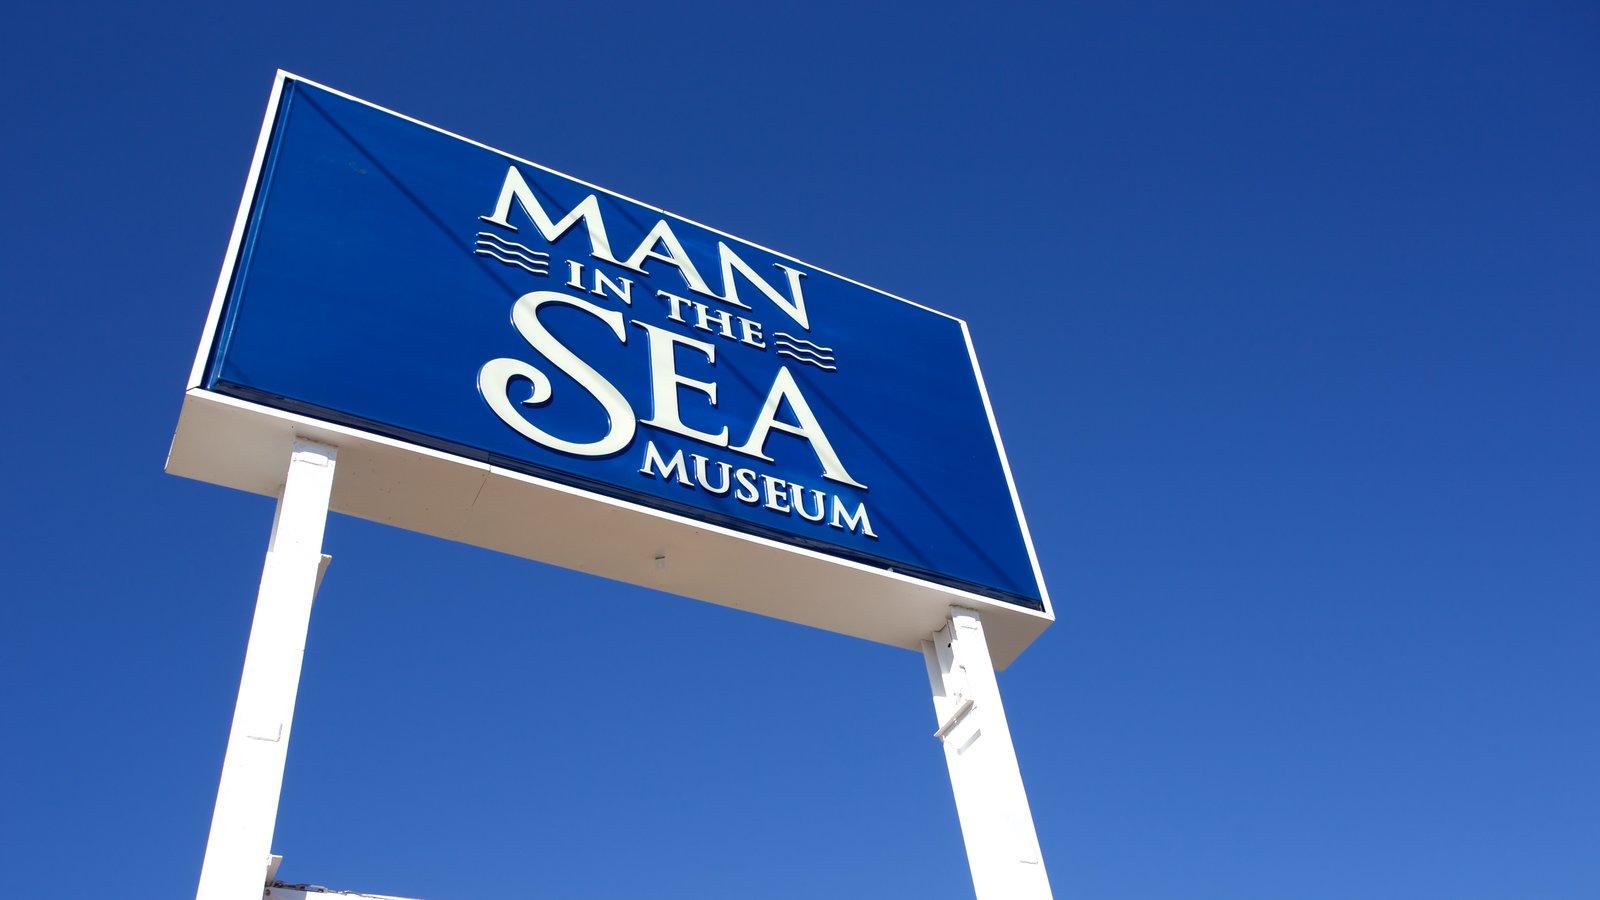 Museum of Man in the Sea que inclui sinalização